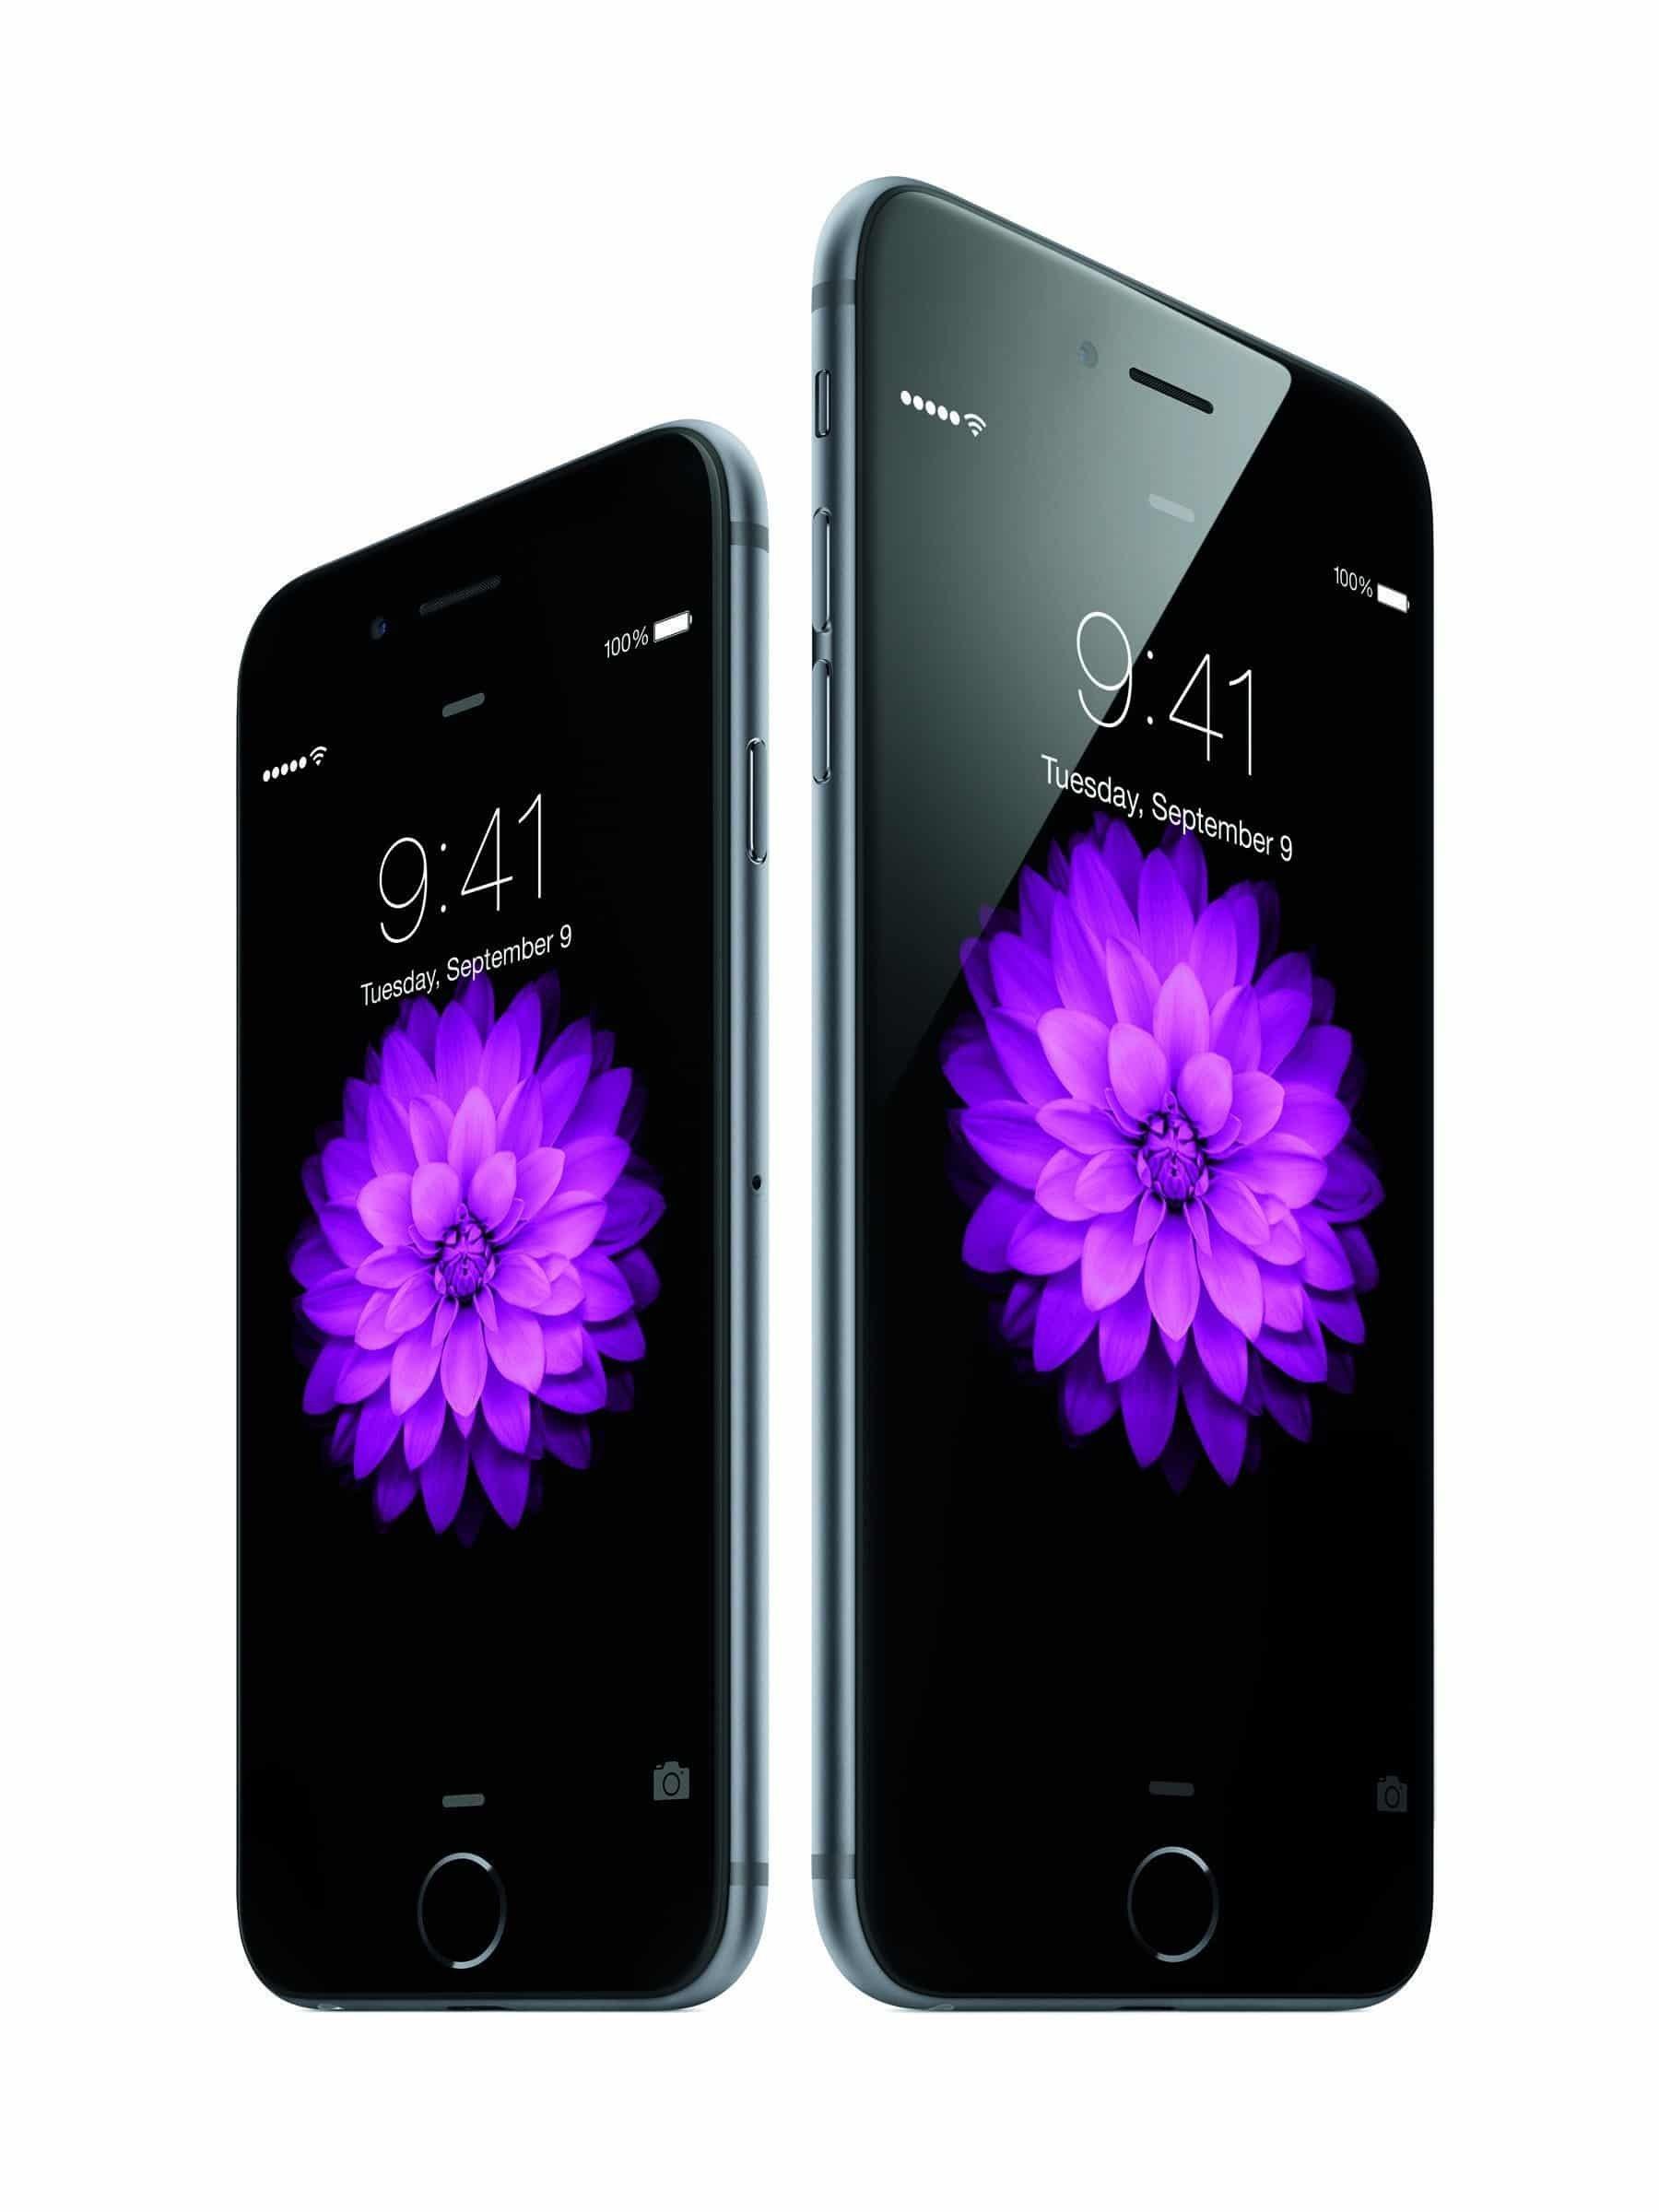 Apple nimmt kaputte iPhones in Zahlung